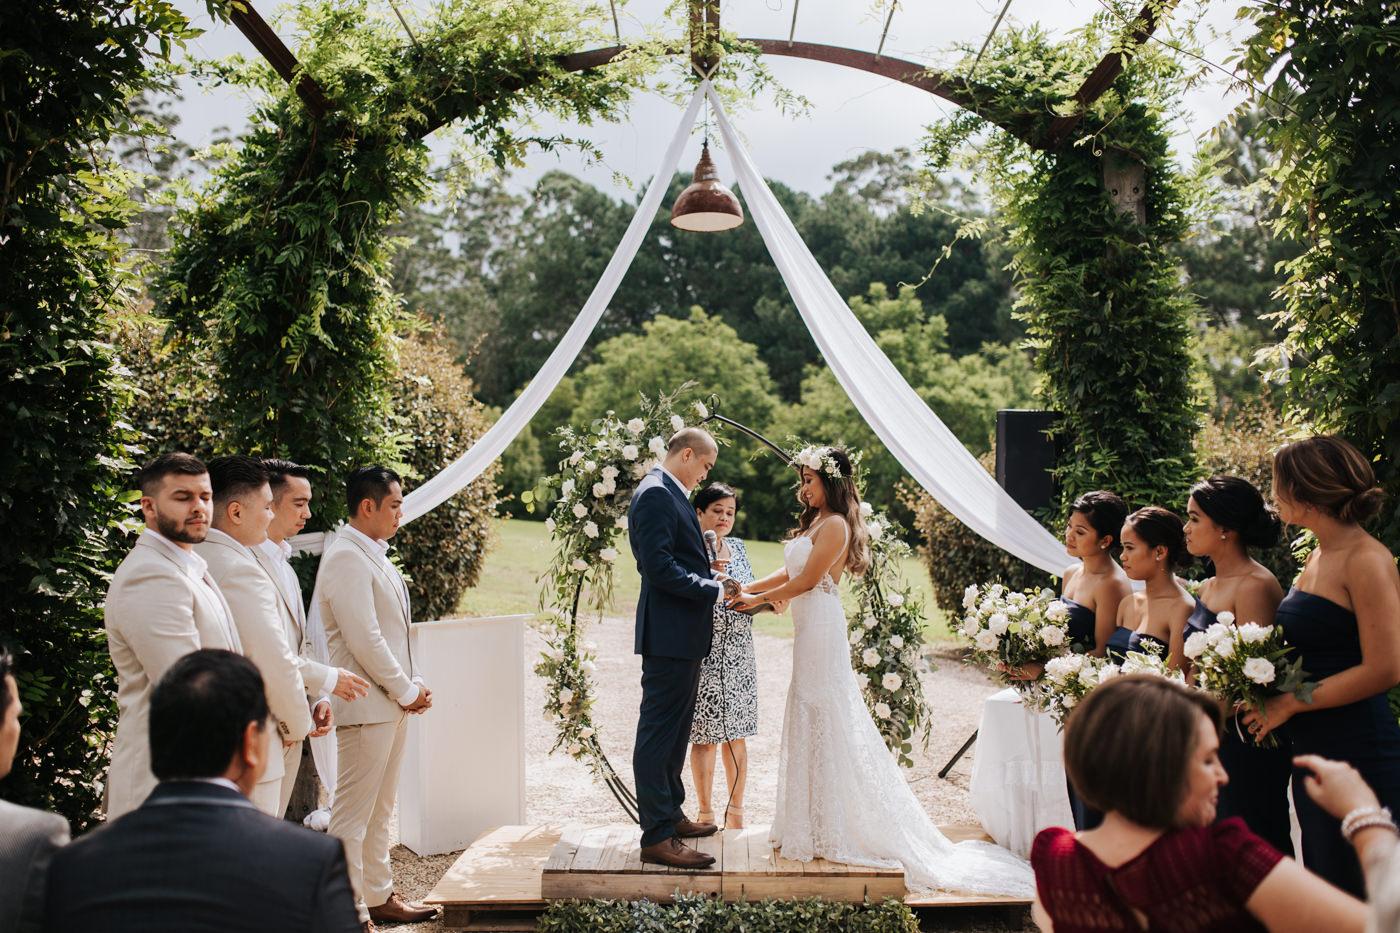 Nick & Vanezza - Fernbank Farm Wedding - Samantha Heather Photography-70.jpg